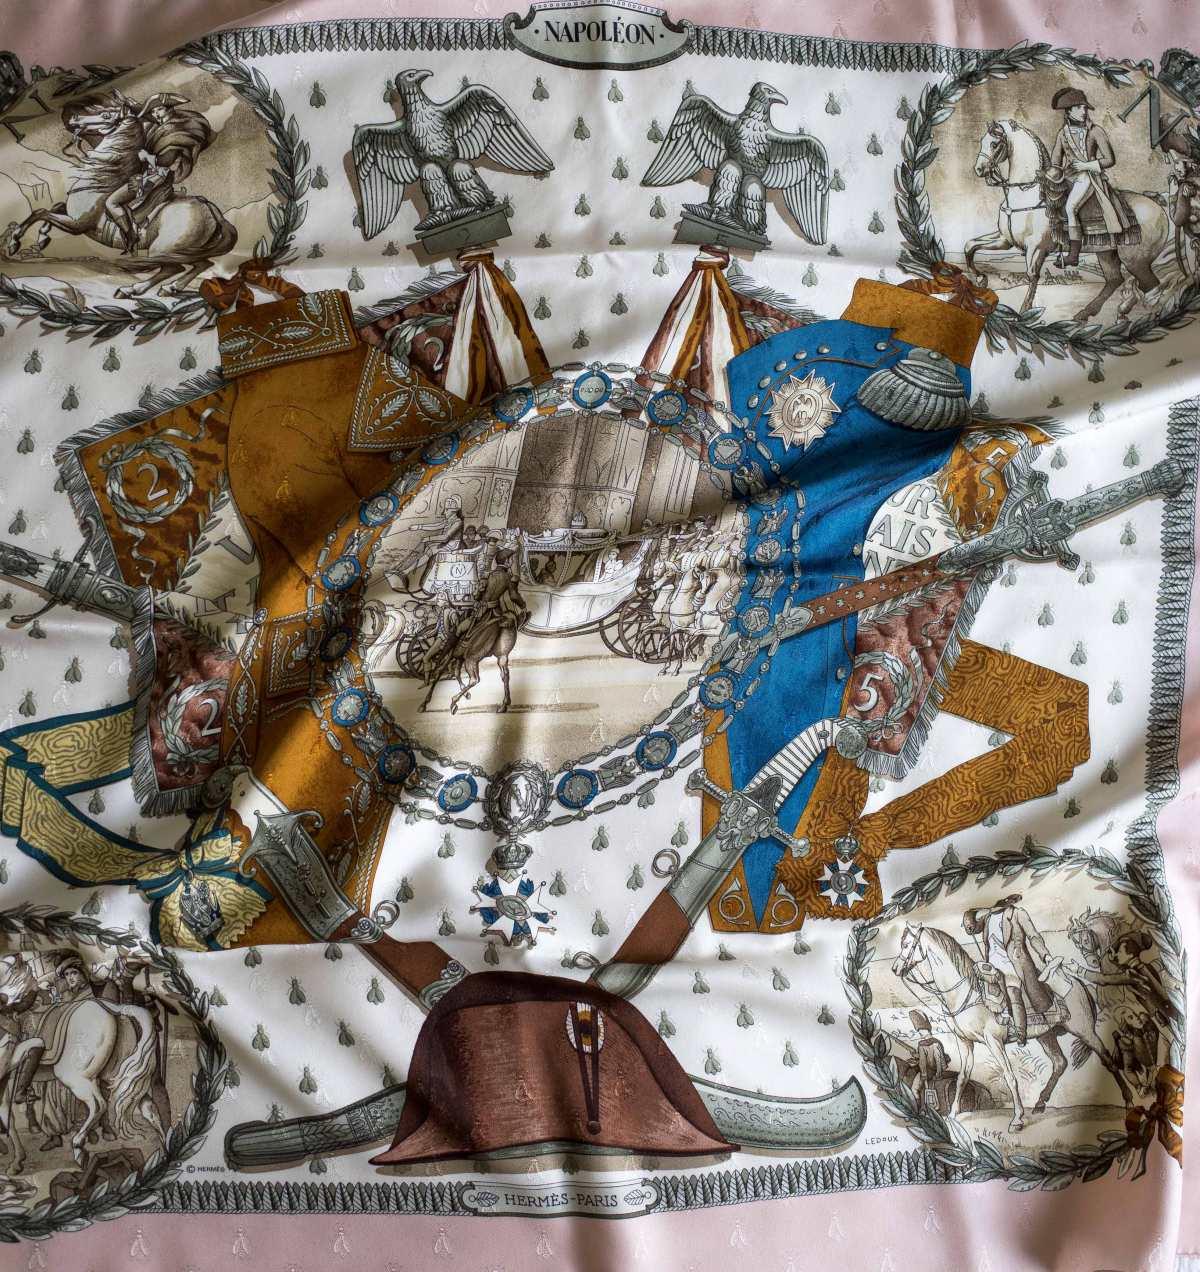 Napoleon, philippe ledoux, Hermes scarf, carre, knot, knotting, tutorial, hermes carre, Hermes Schal, эрмес, платок, карре, как красиво завязать платок, how to wear a scarf